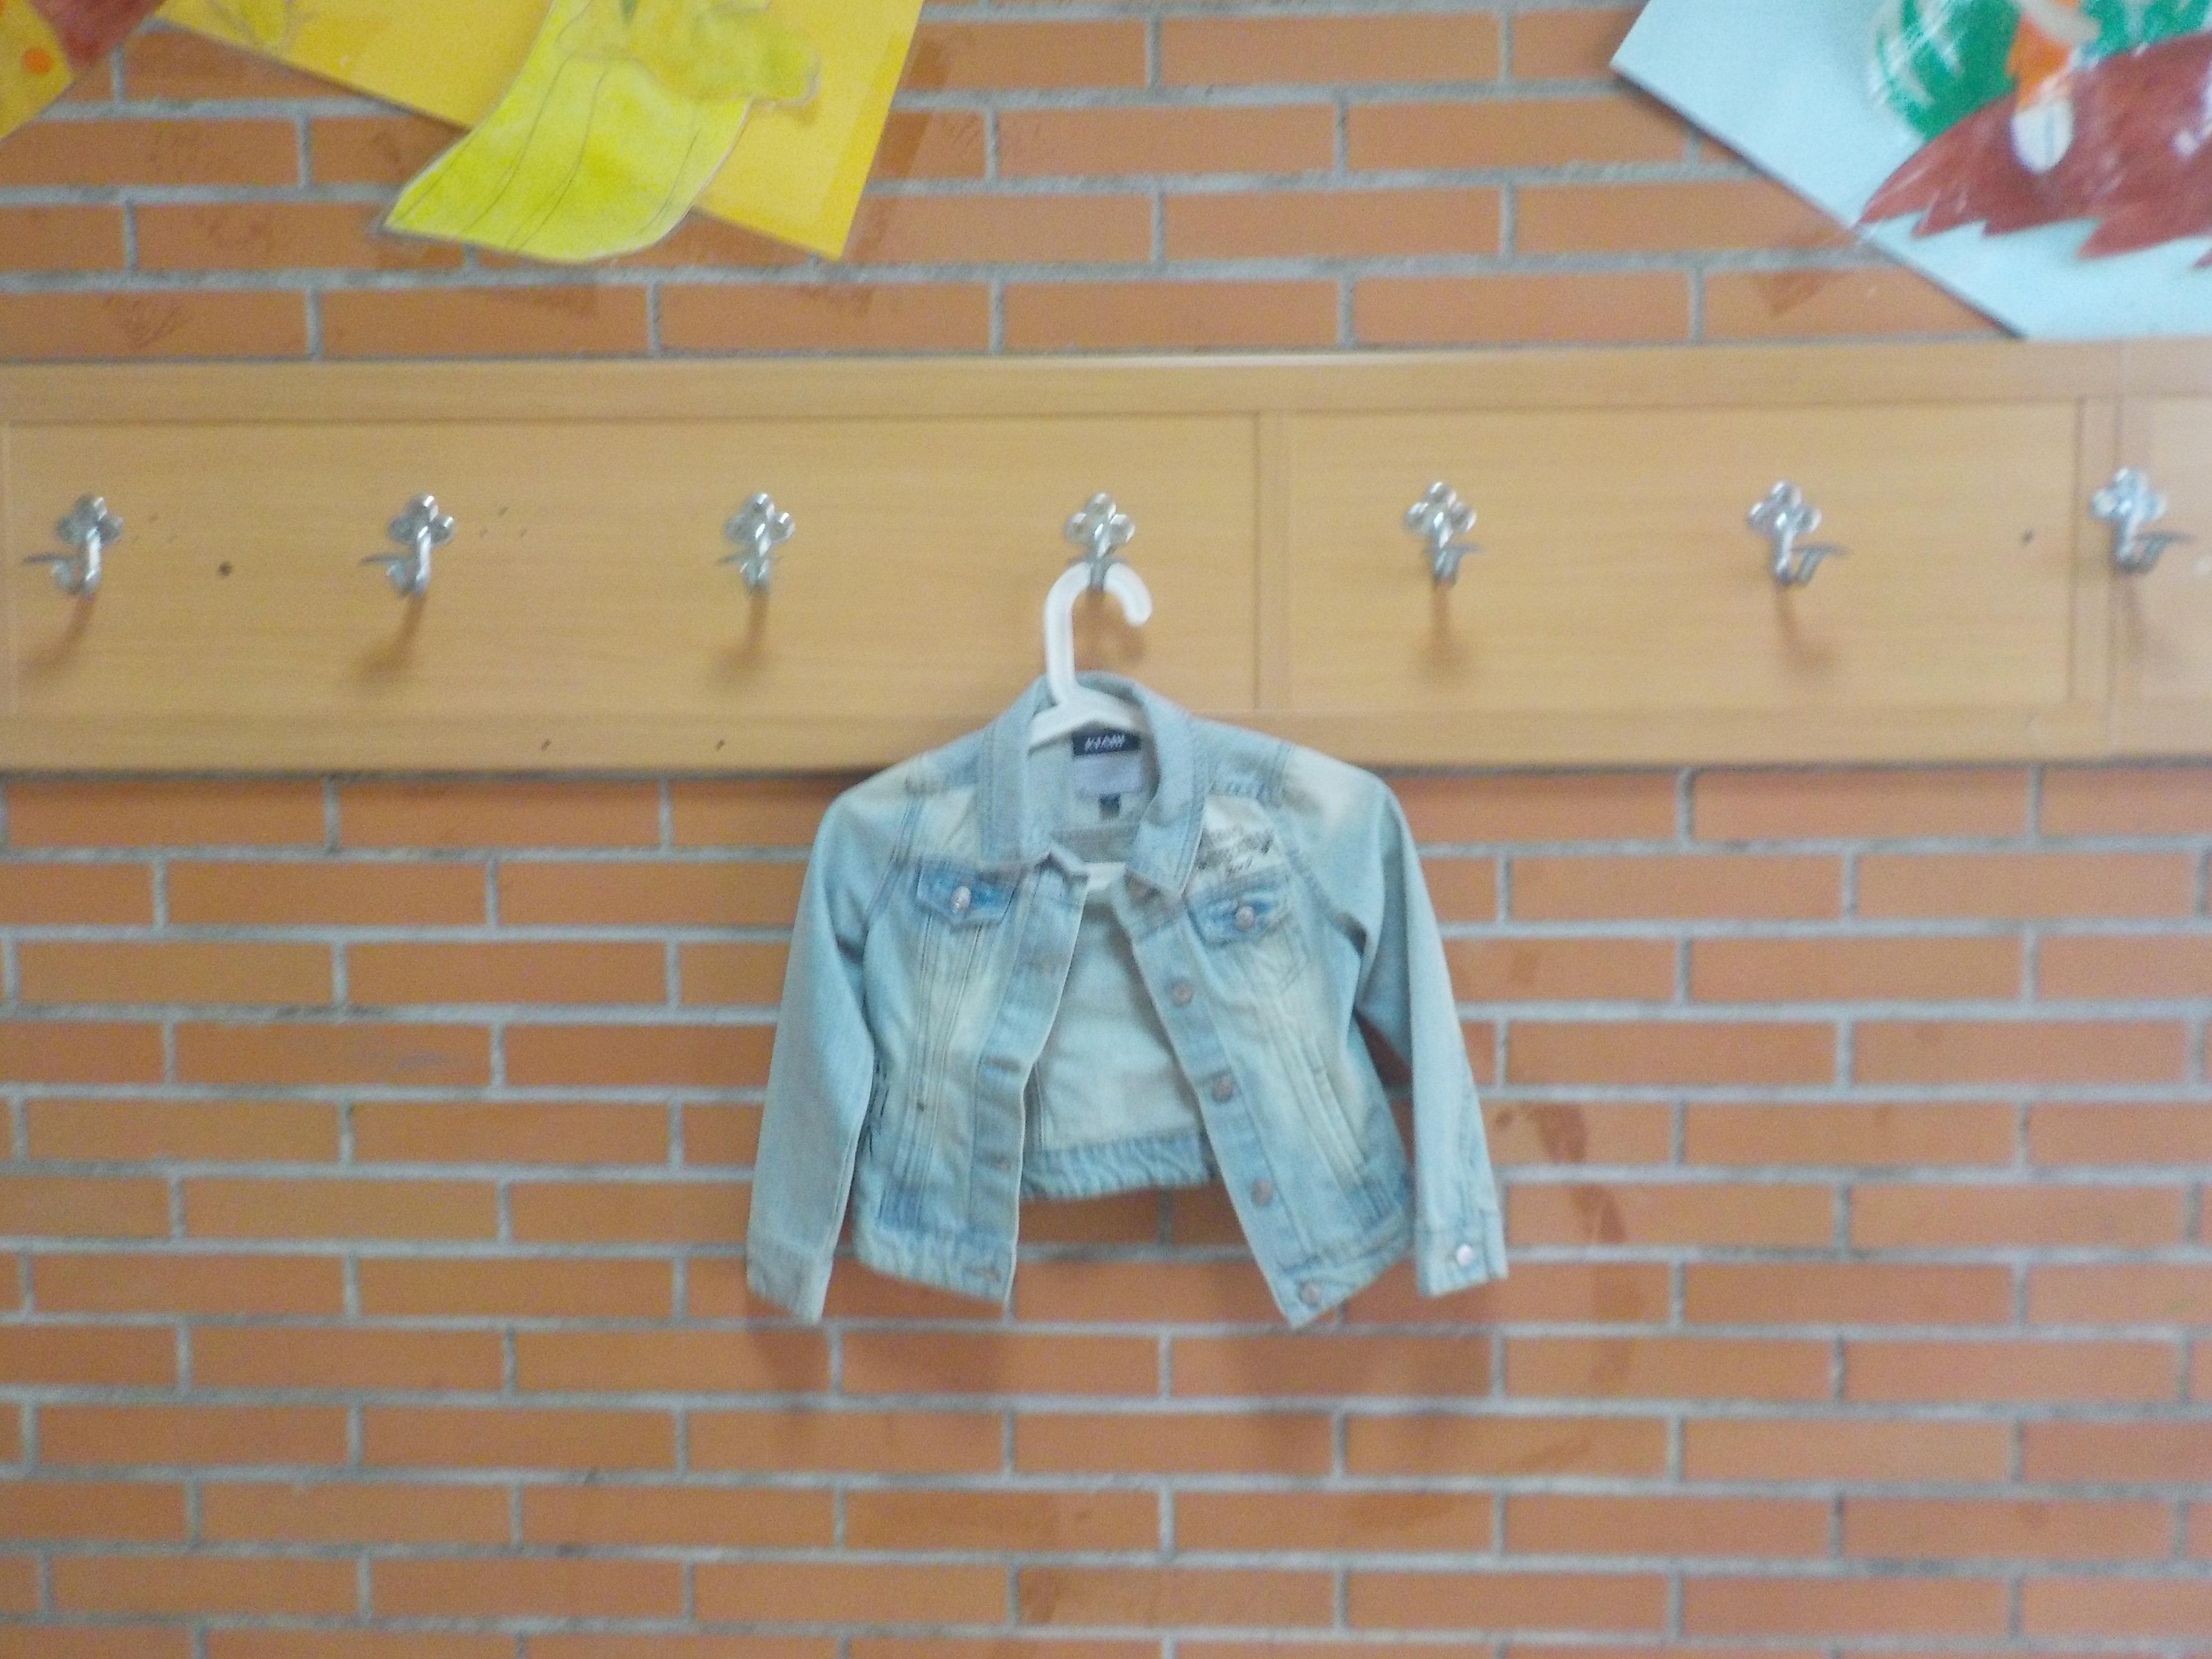 Catalogo de ropa olvidada 2  2018